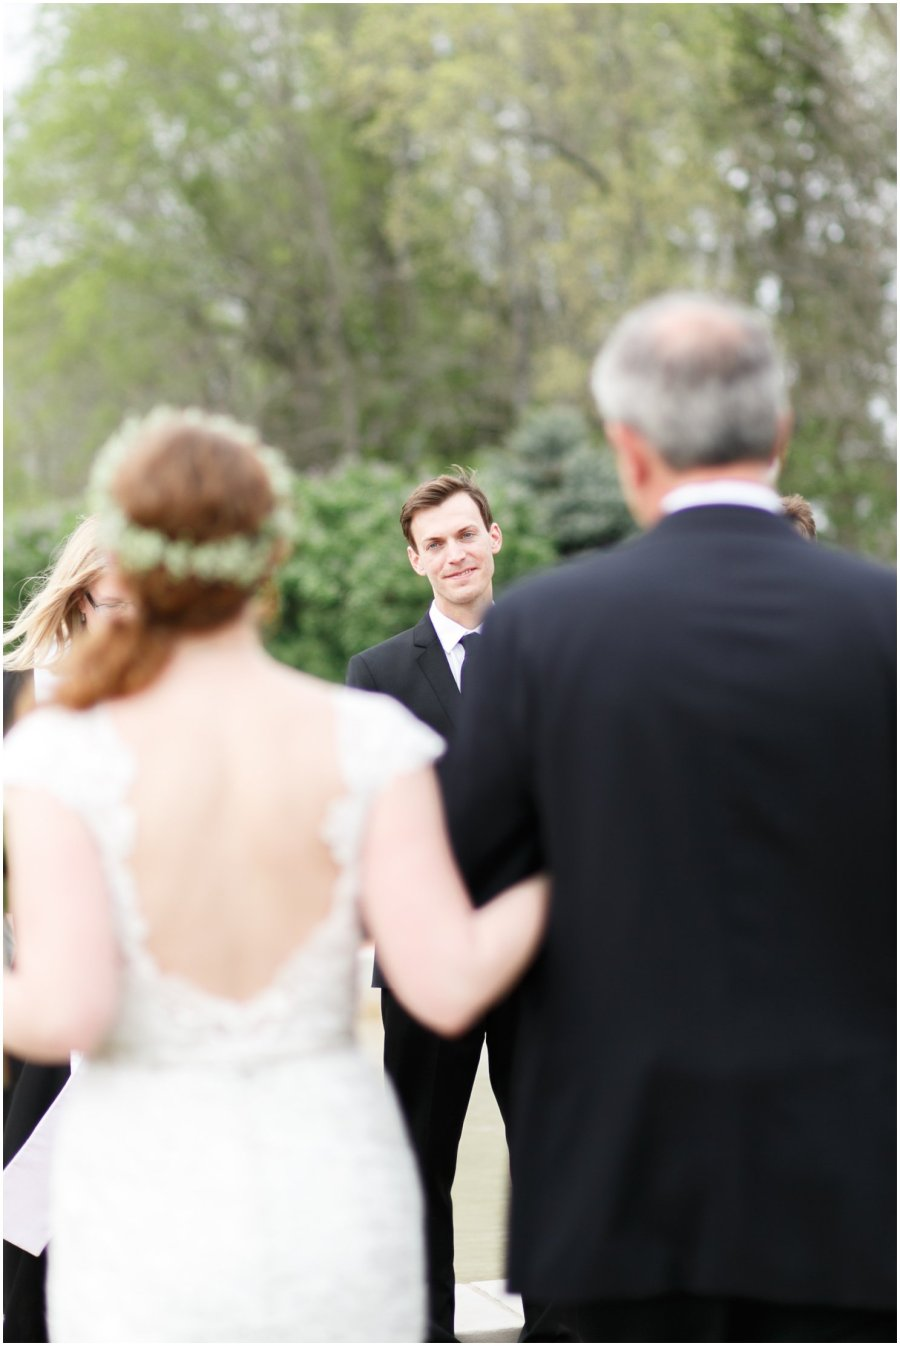 Alea Lovely Fine Art Wedding Photographer